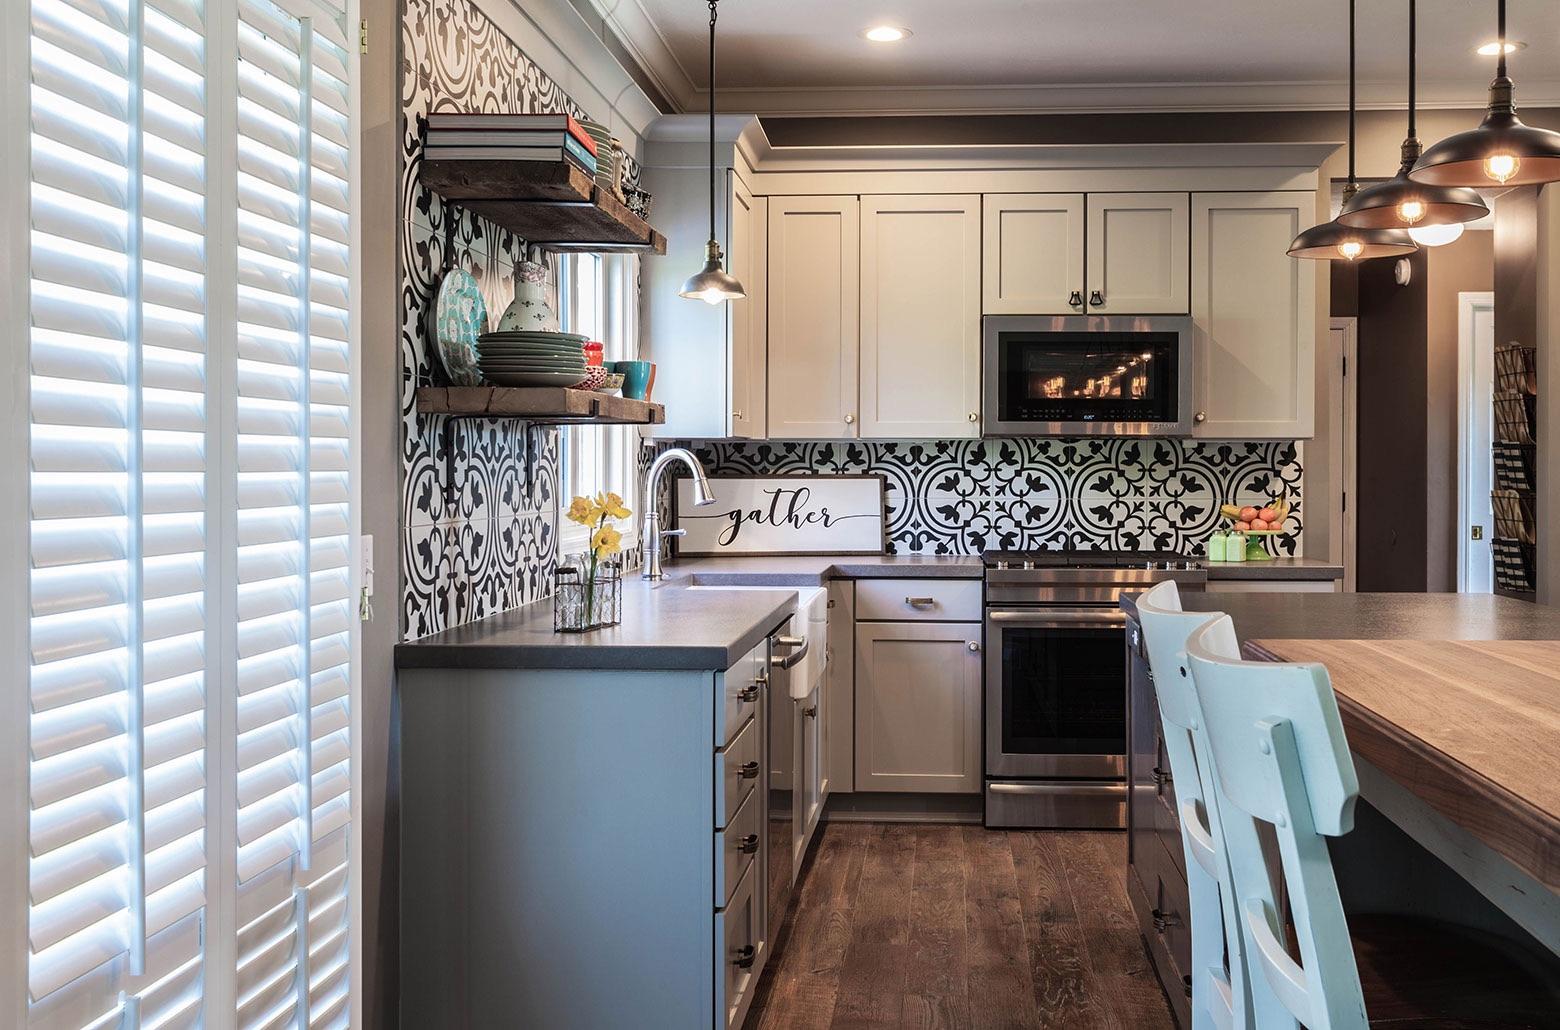 kitchen interior with white cabinets